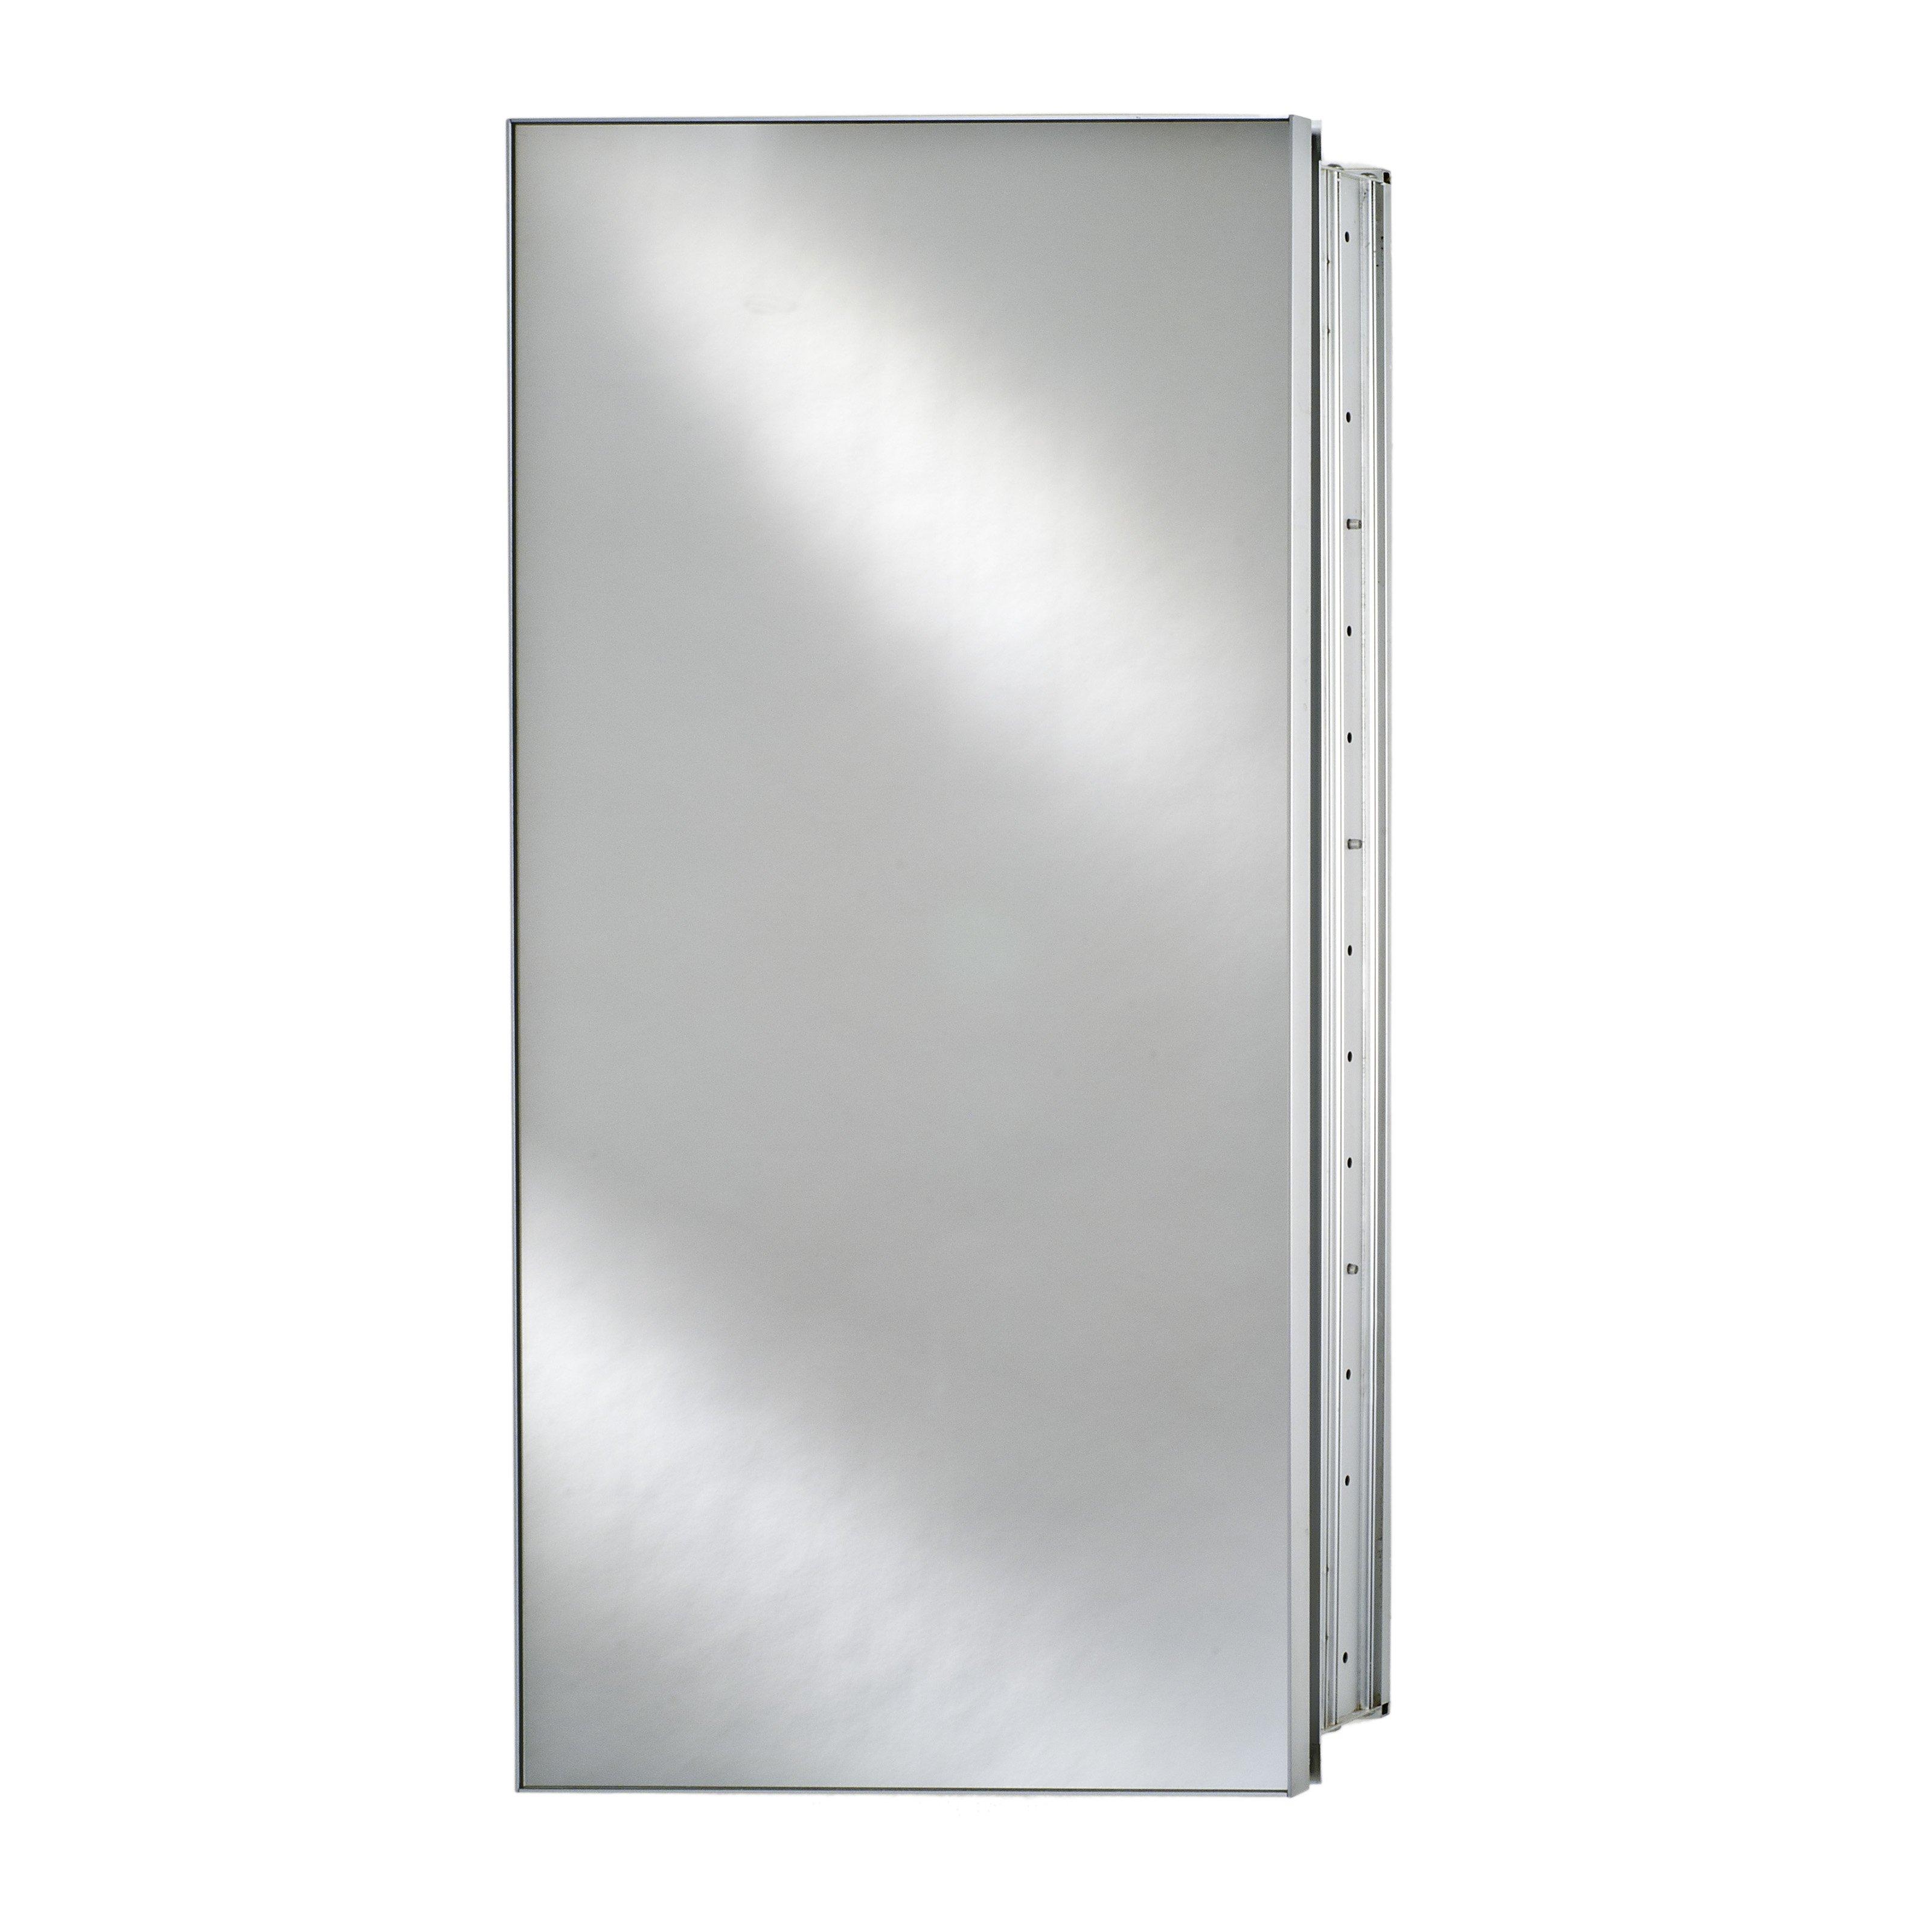 Afina Broadway Surface Mount Single Door Medicine Cabinet - 24W x 4D x 30H in.